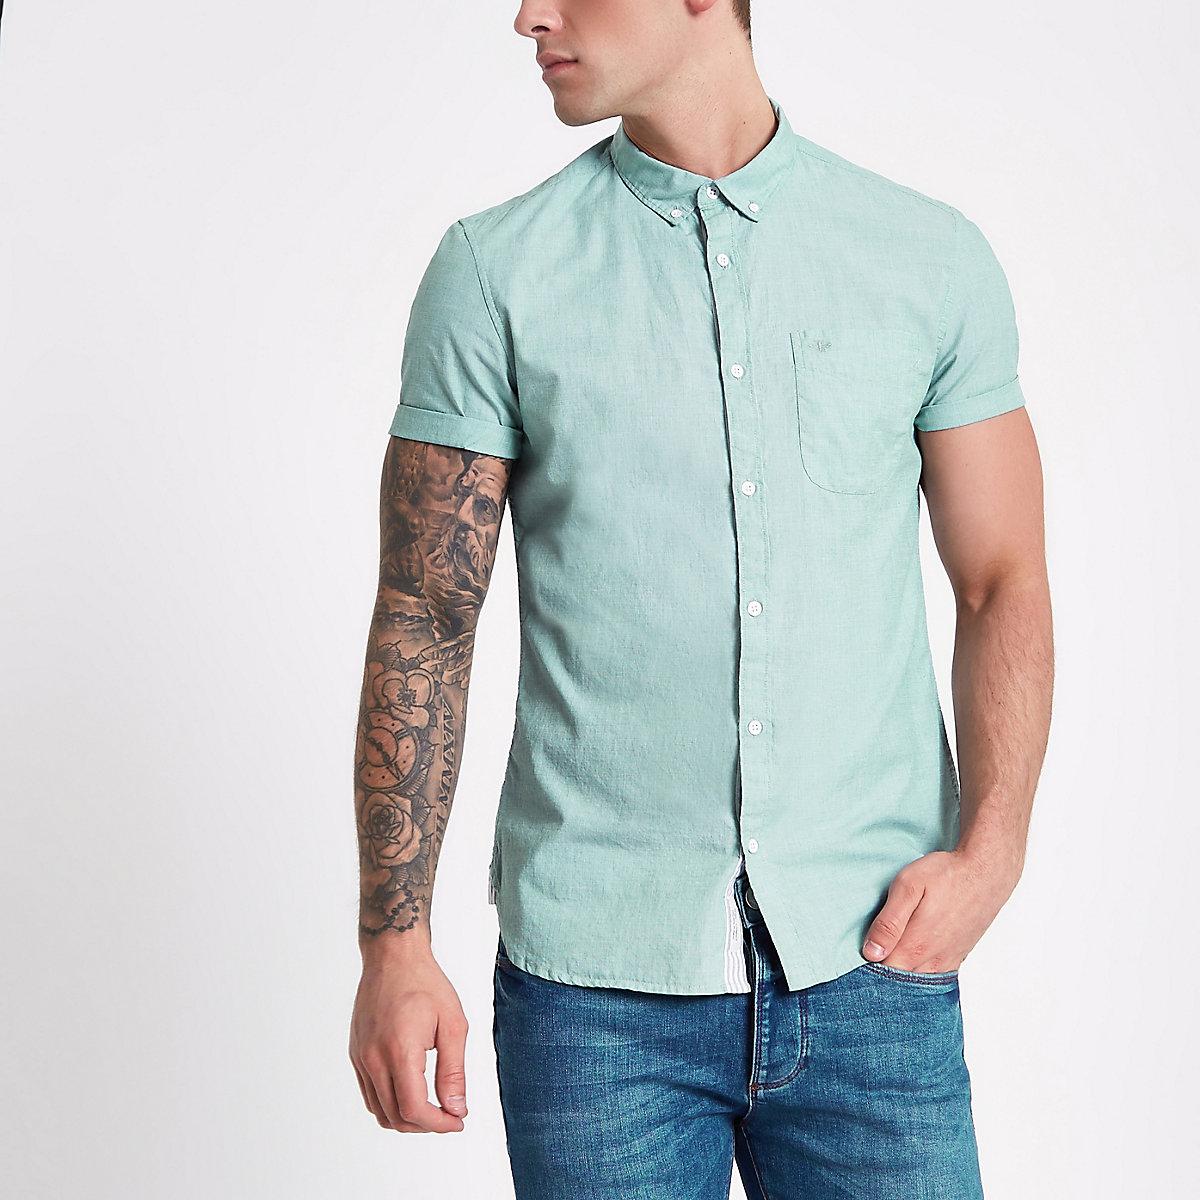 Teal green slim fit short sleeve shirt